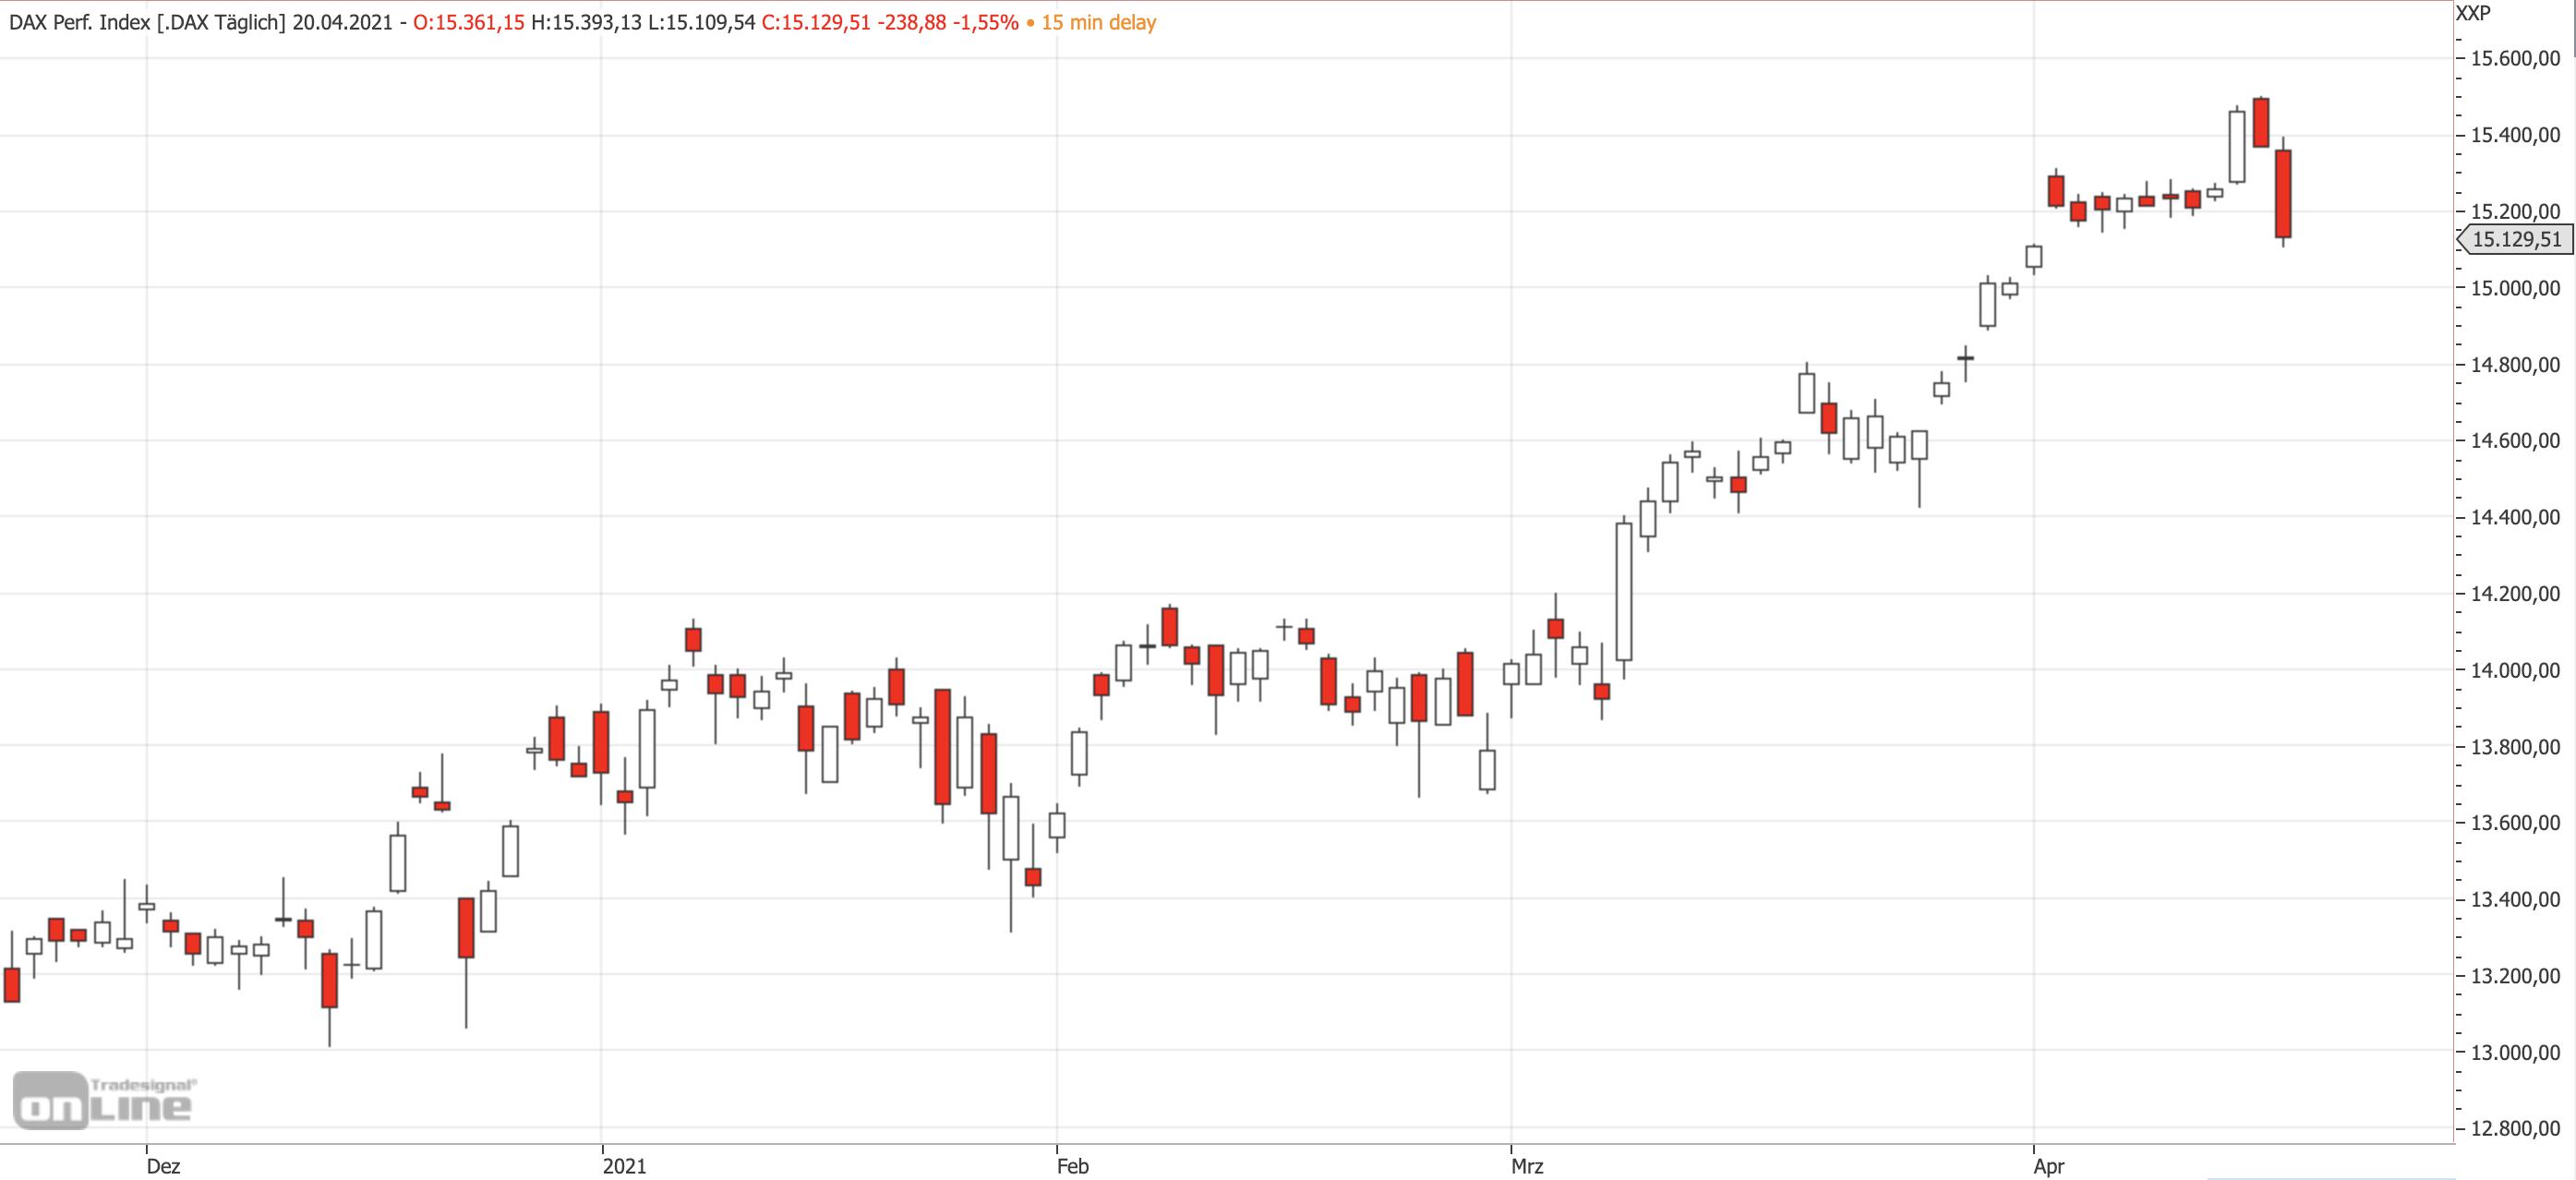 Mittelfristiger DAX-Chart am 20.04.2021